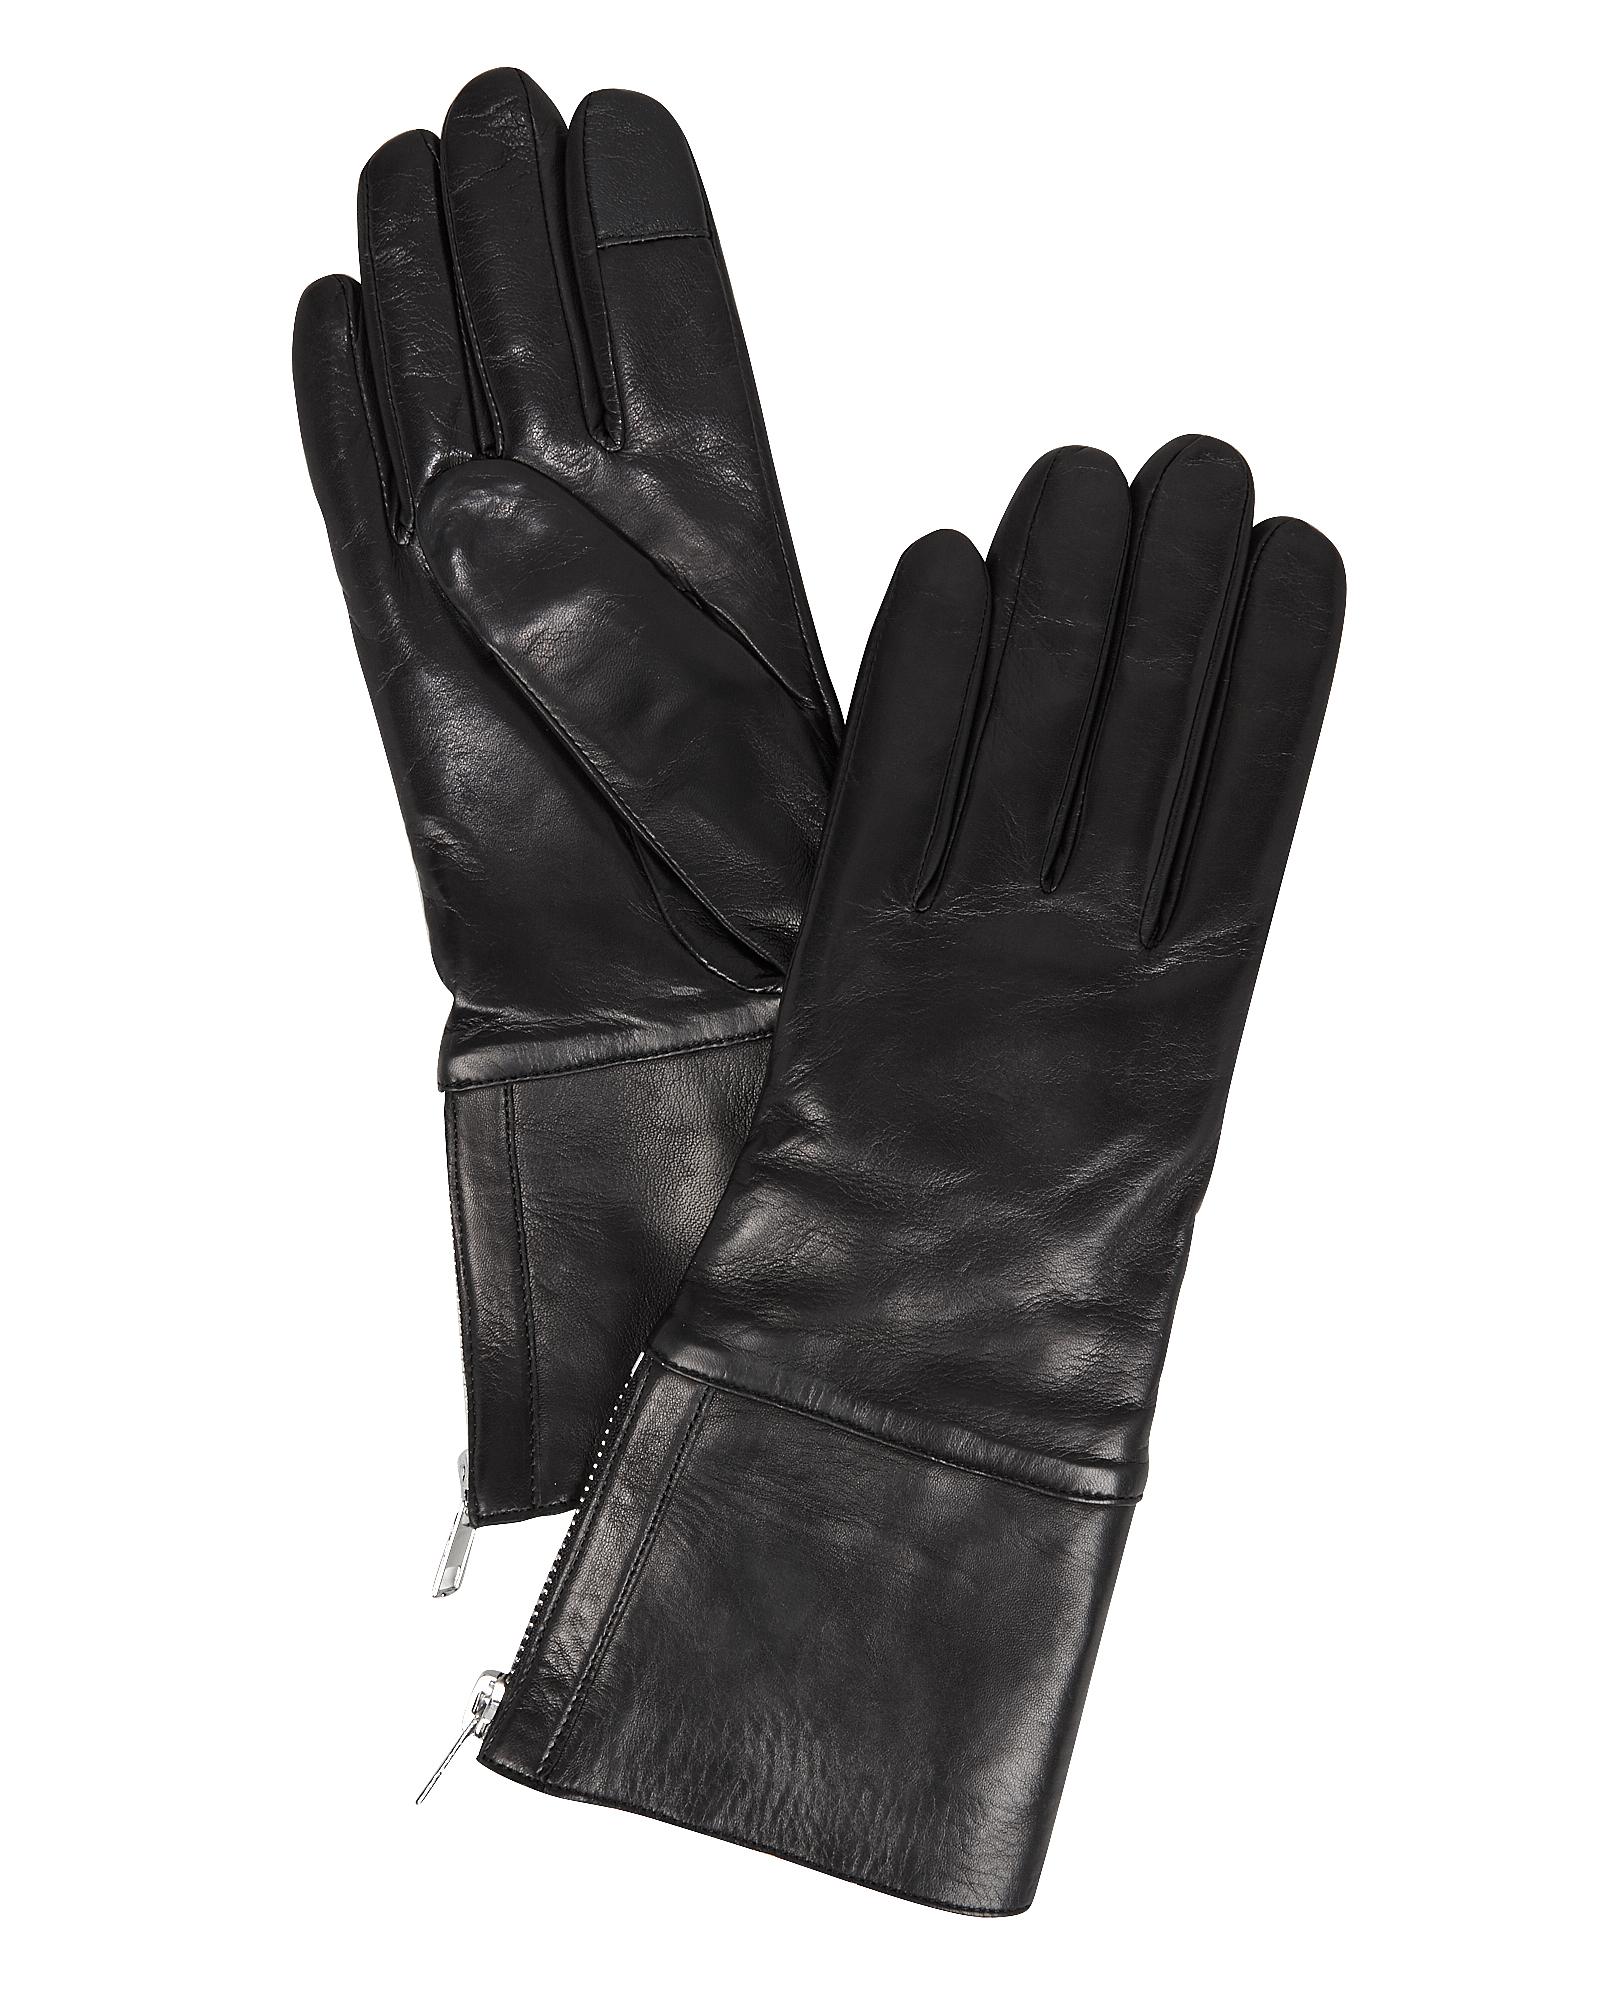 CAROLINA AMATO Carolina Aato Side Zip Black Gloves Black